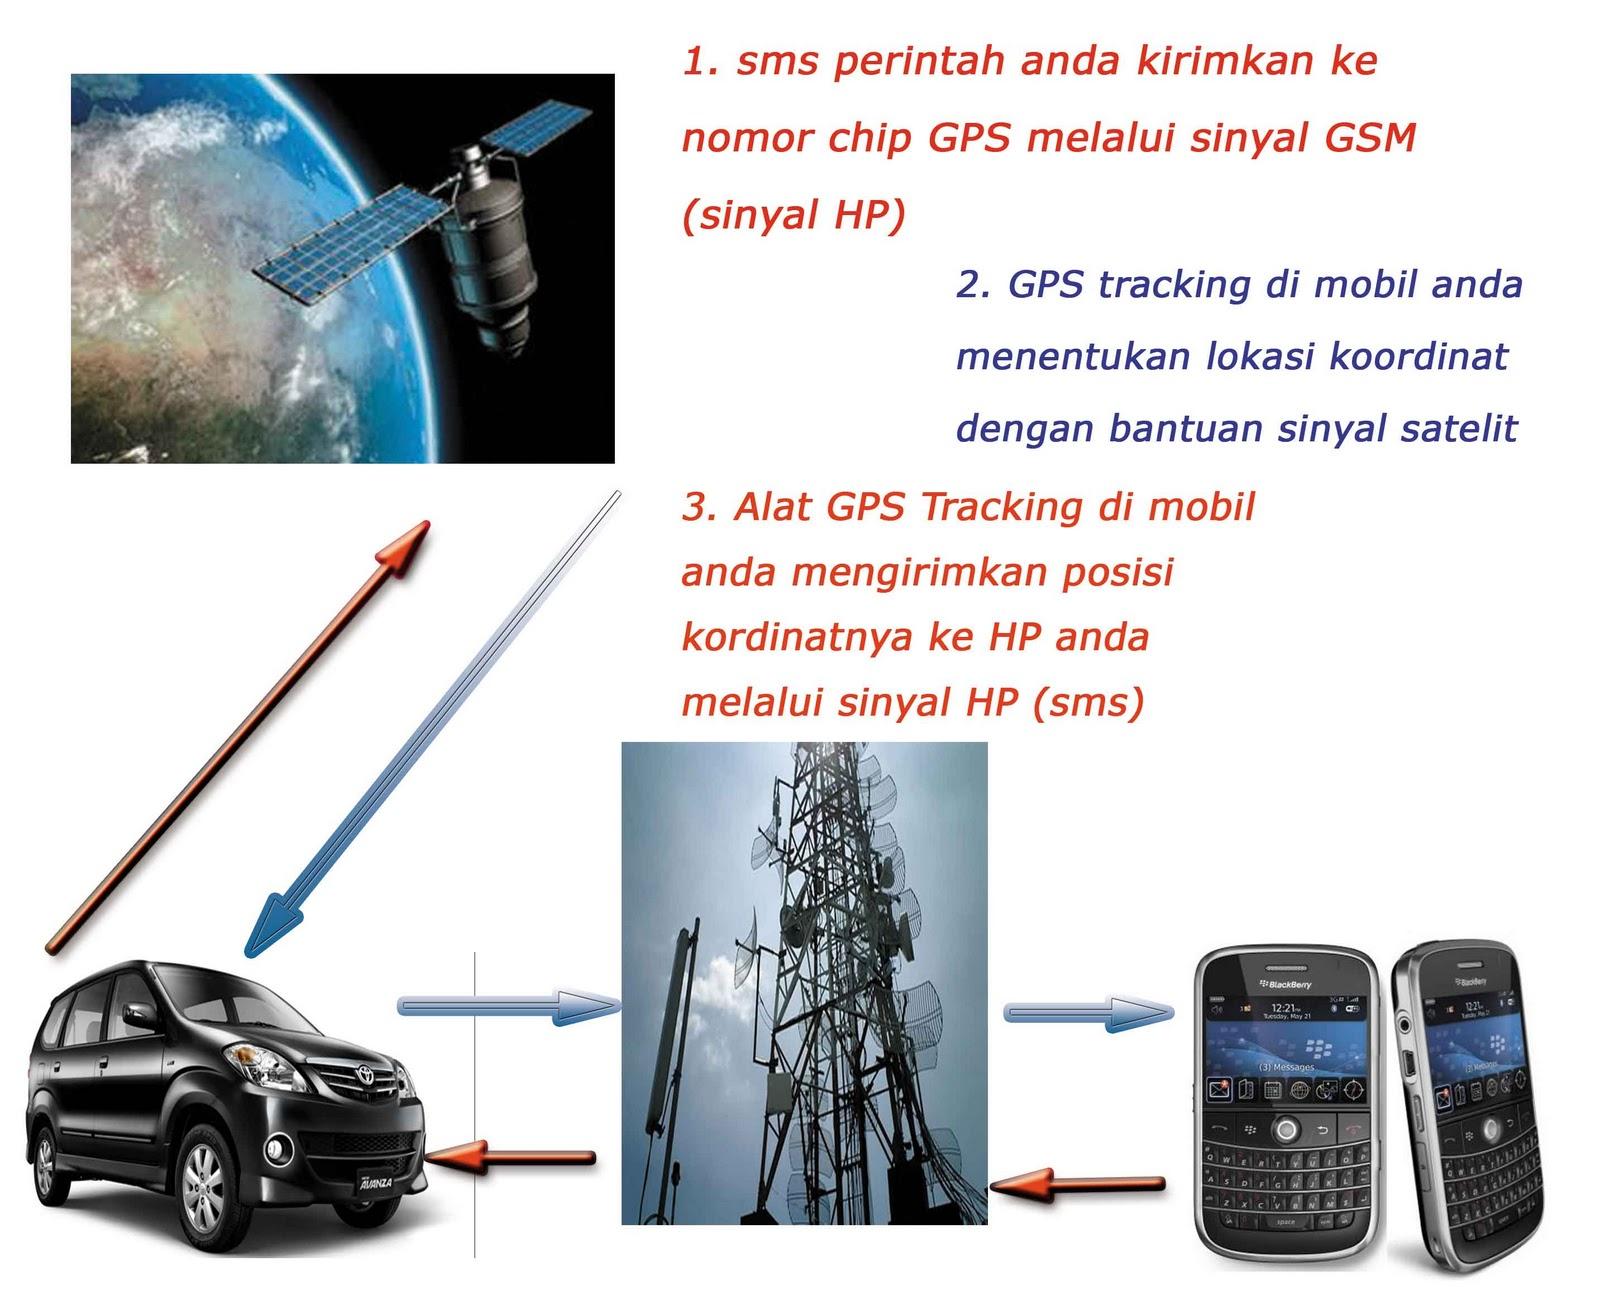 Pemasangan Gps Tracker Jual Gps Mobil Murah